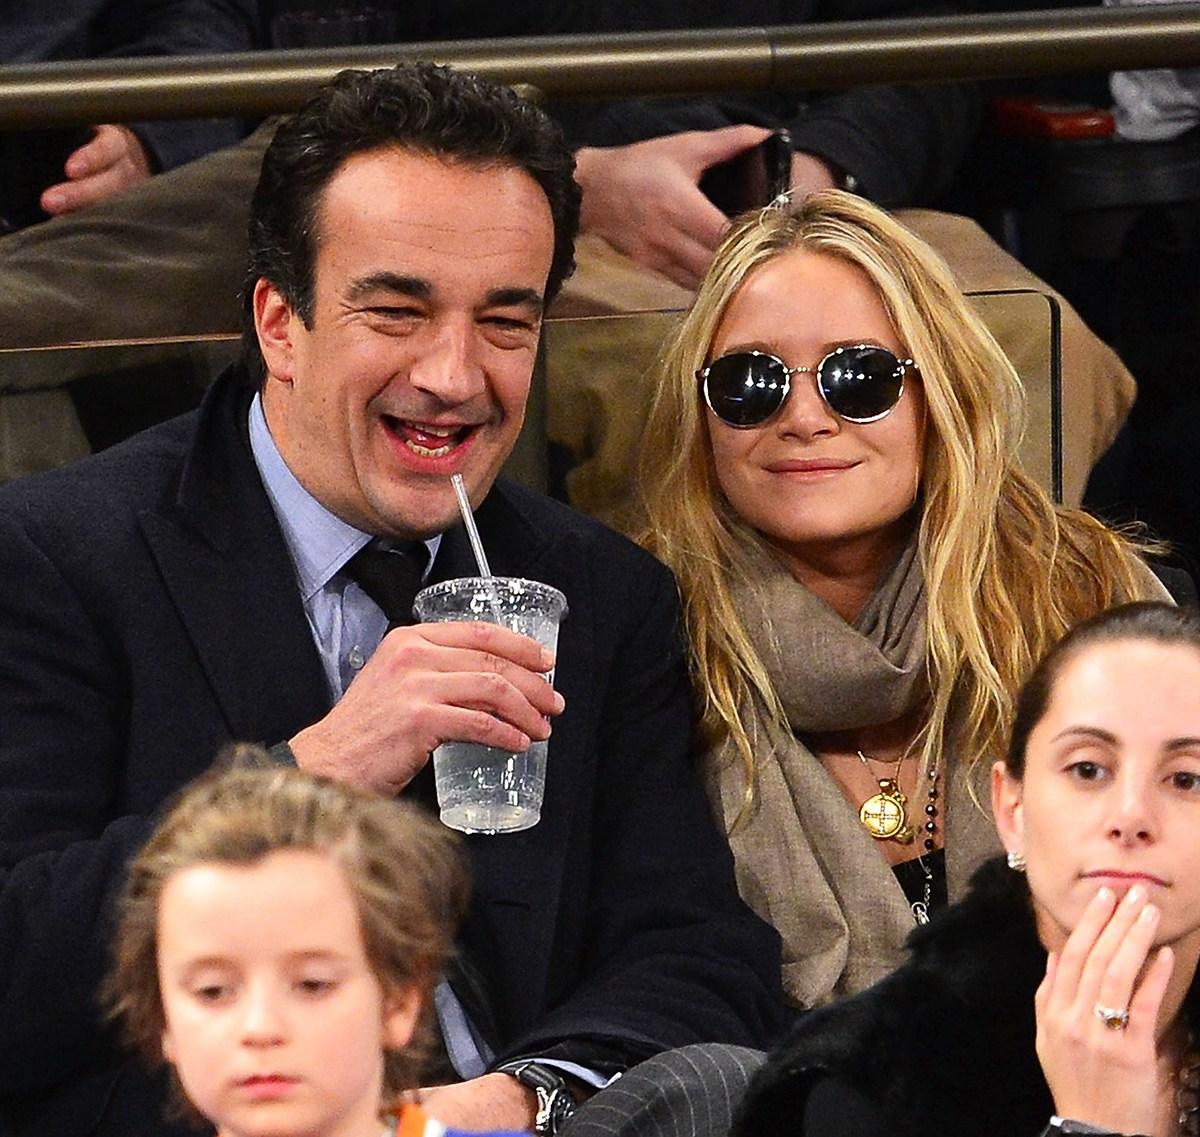 Mary Kate Olsen And Olivier Sarkozys Relationship Timeline